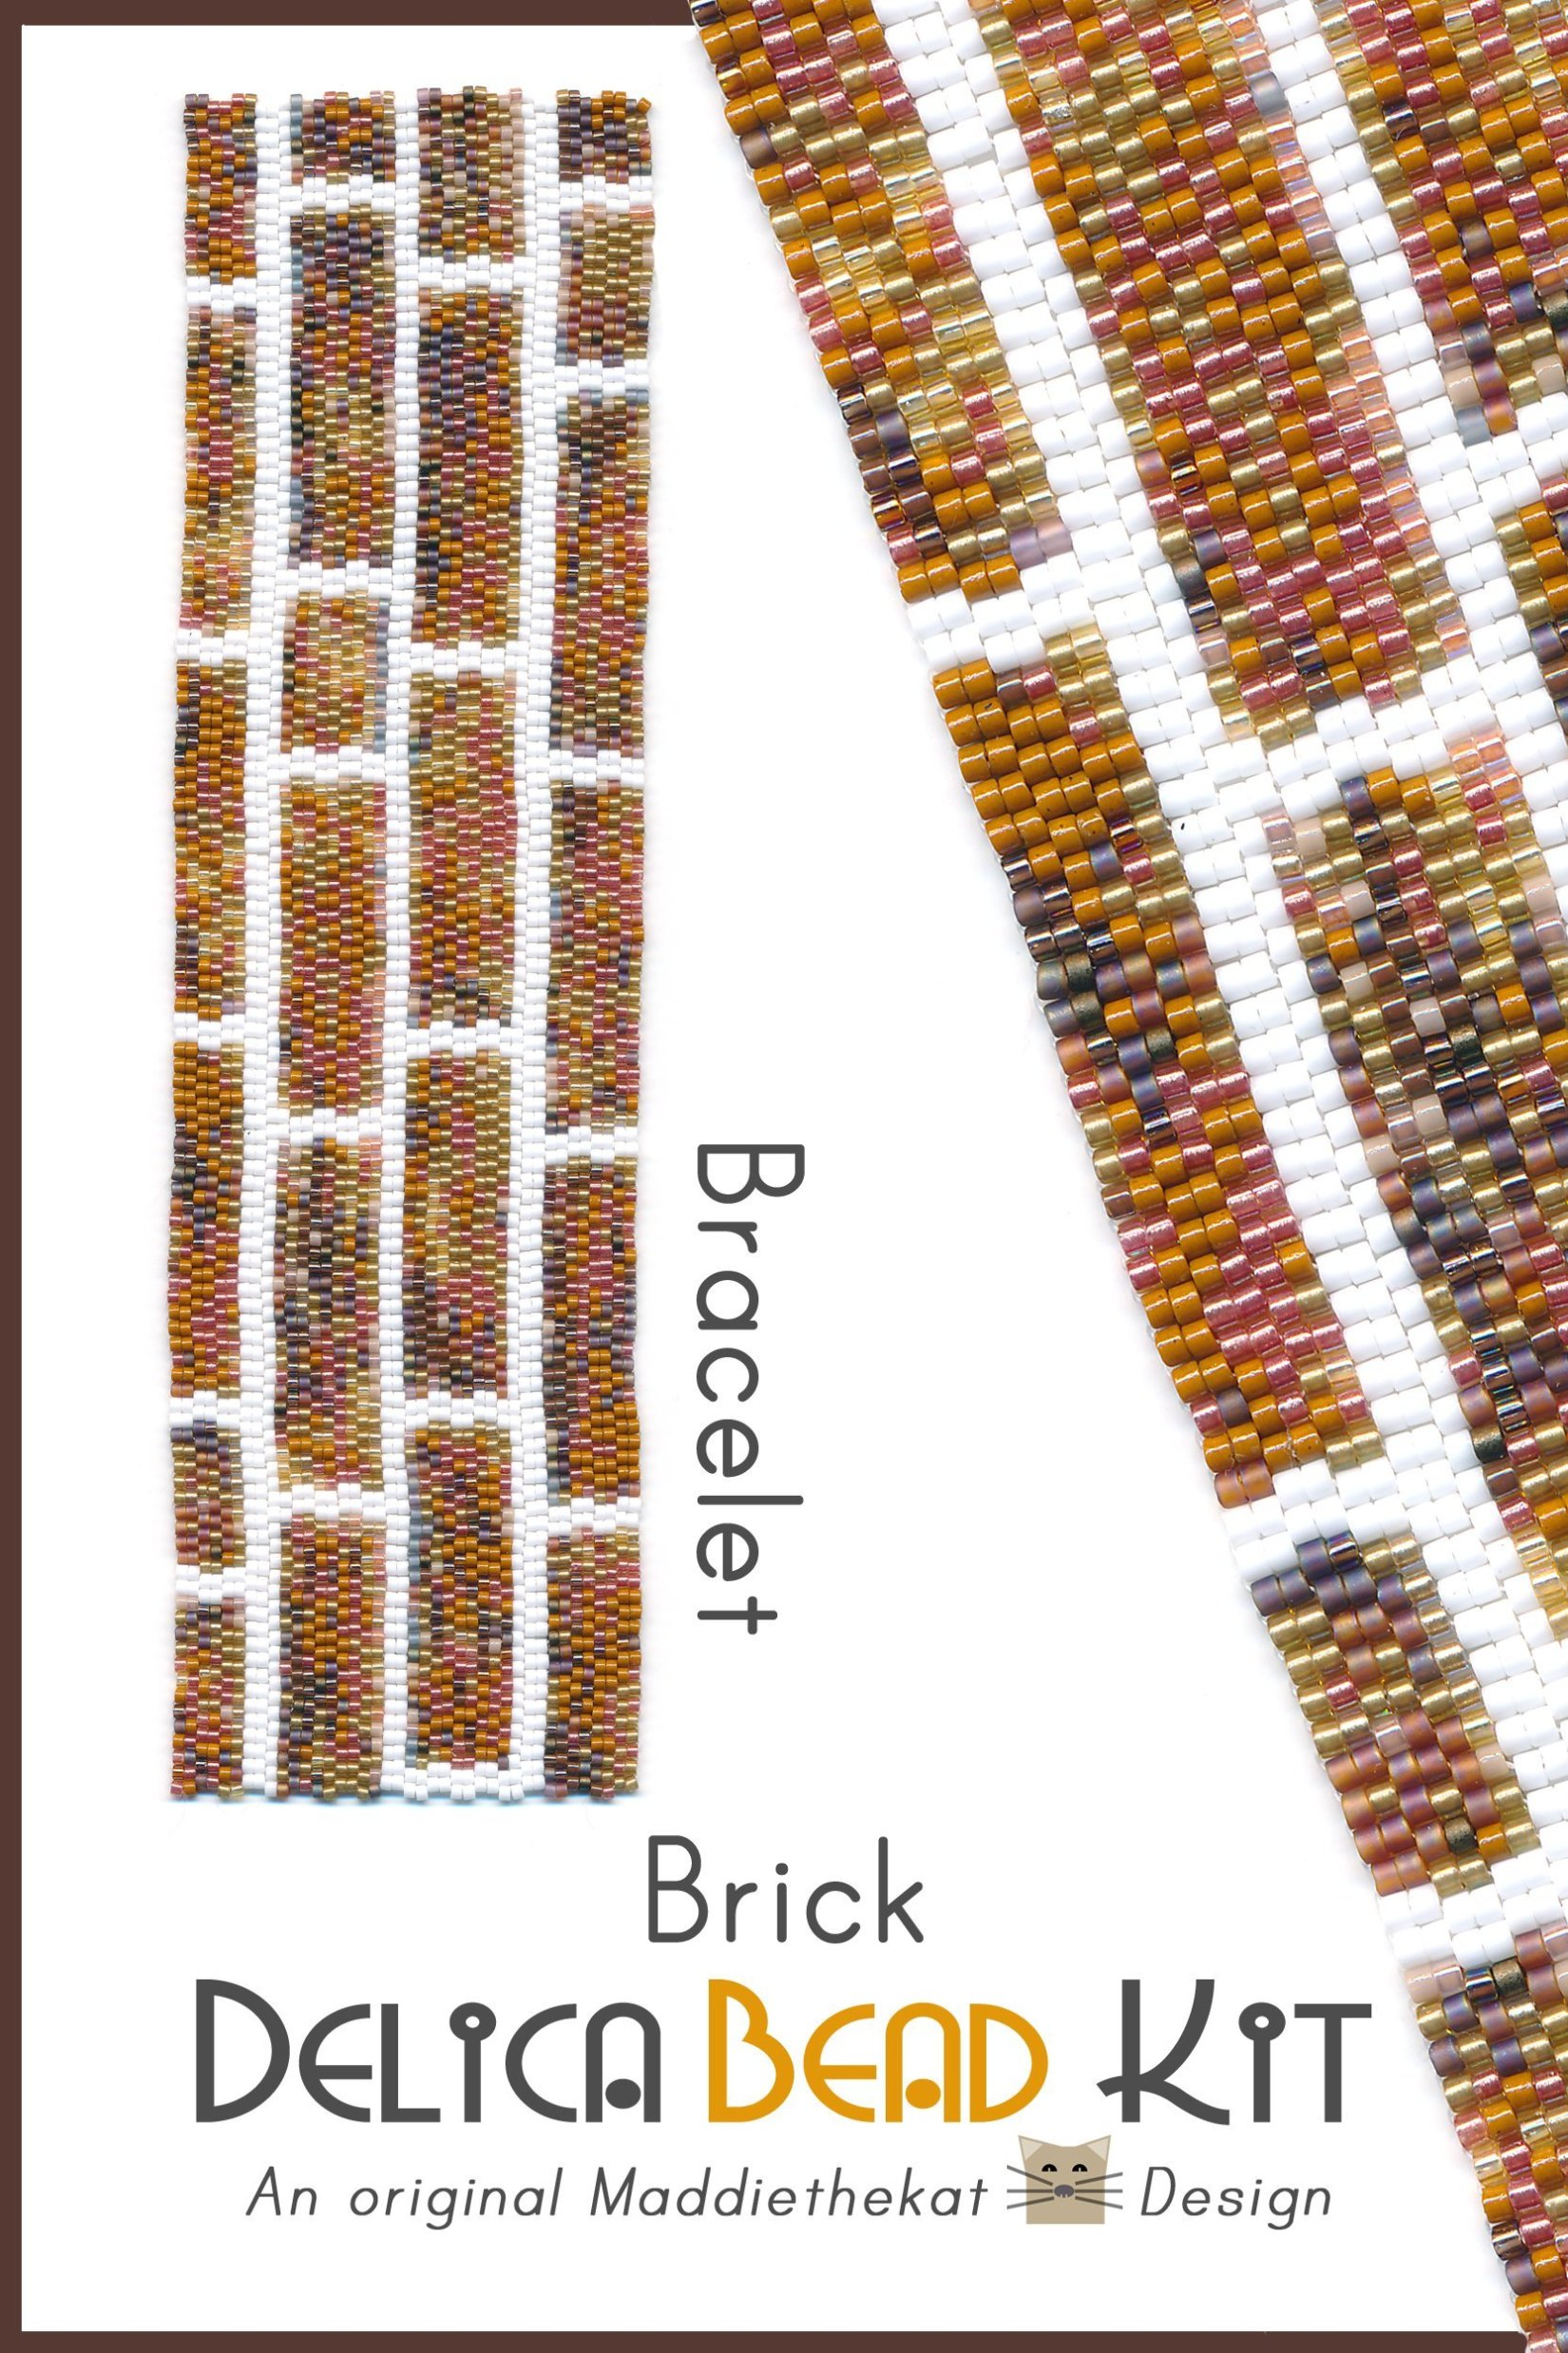 Brick Wall Wide Cuff Bracelet 2-Drop Peyote Bead Pattern or Bead Kit